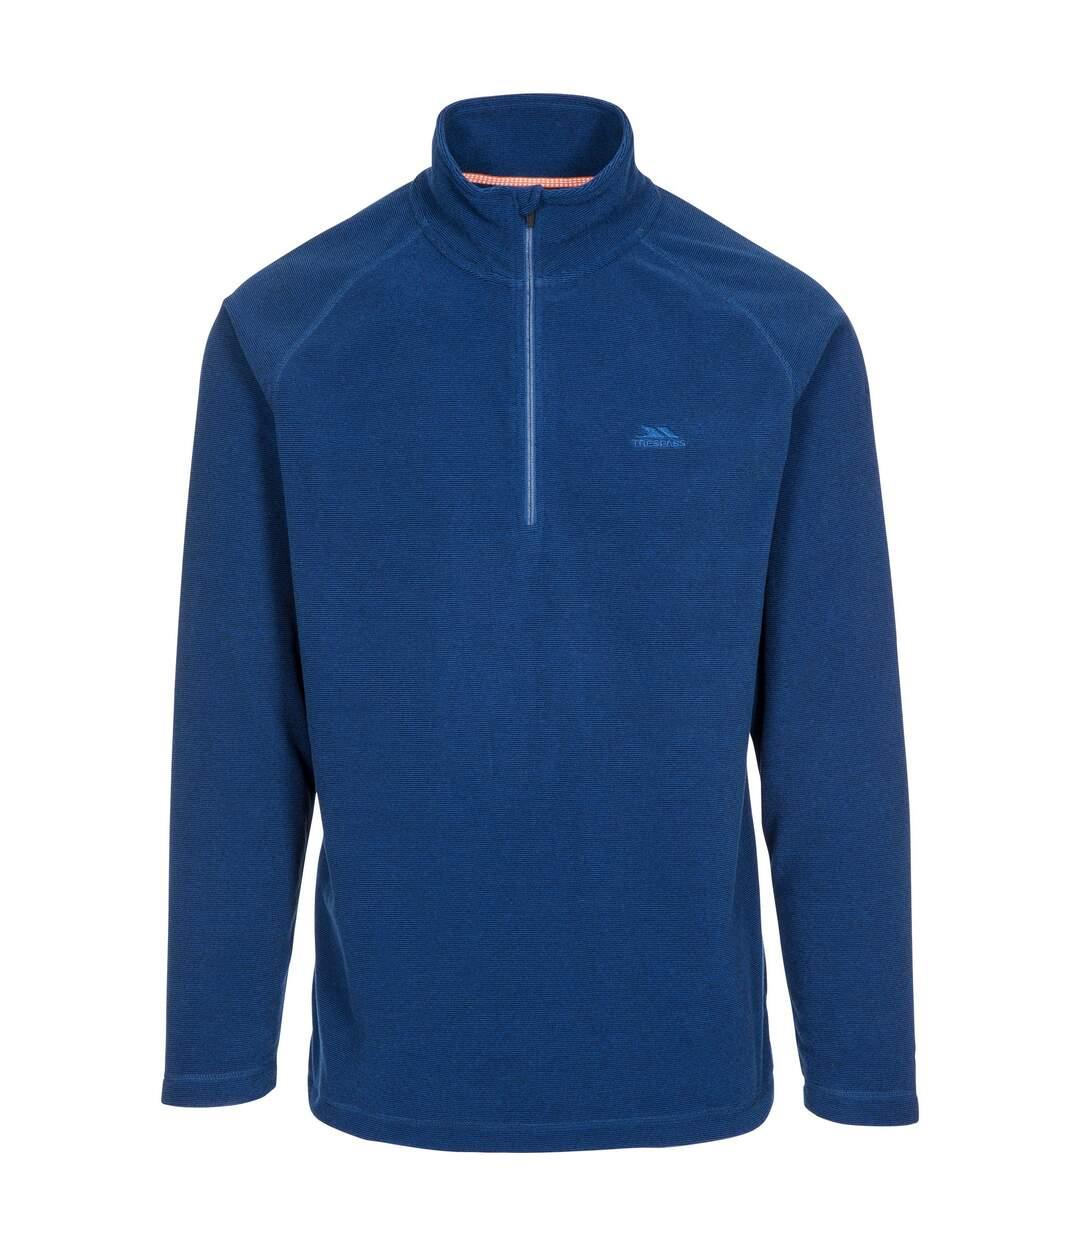 Trespass Mens Keynote Anti Pilling 1/4 Zip Fleece Top (Charcoal) - UTTP4242